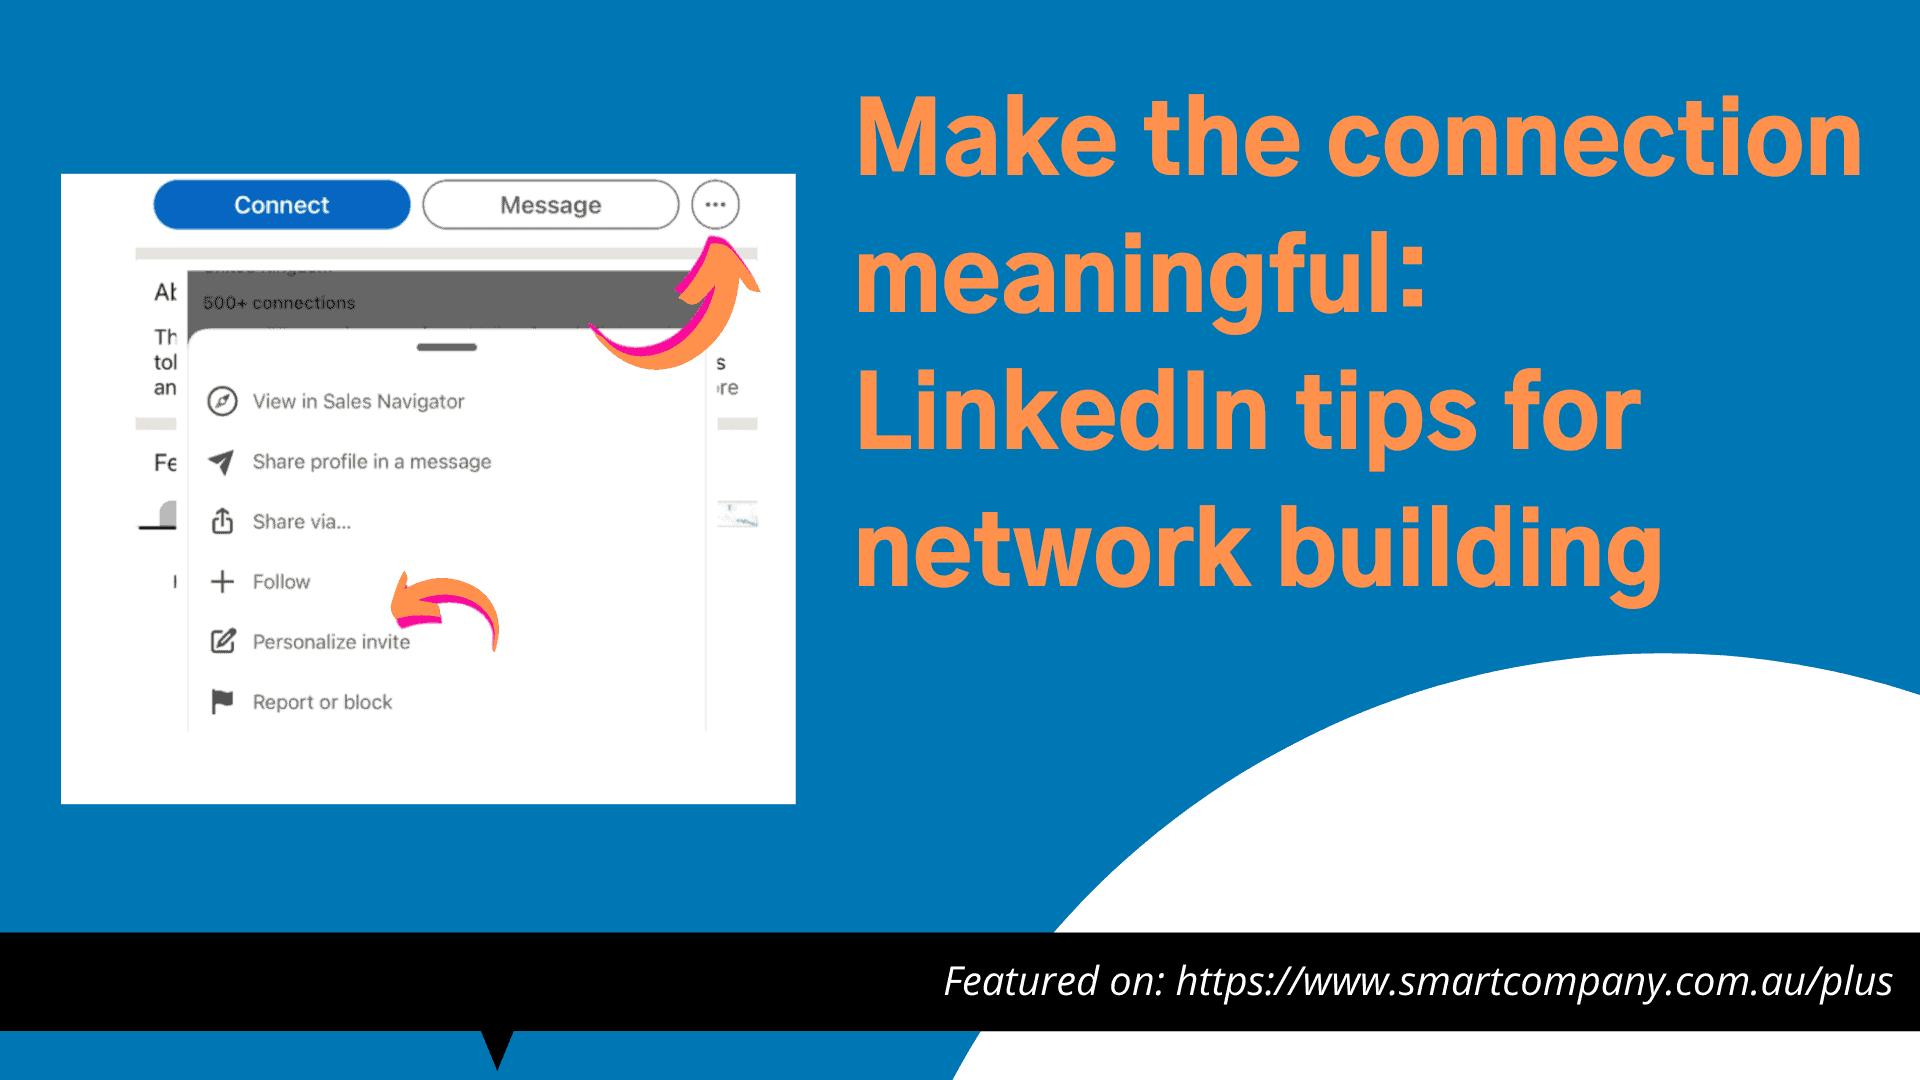 LinkedIn Tips for network building